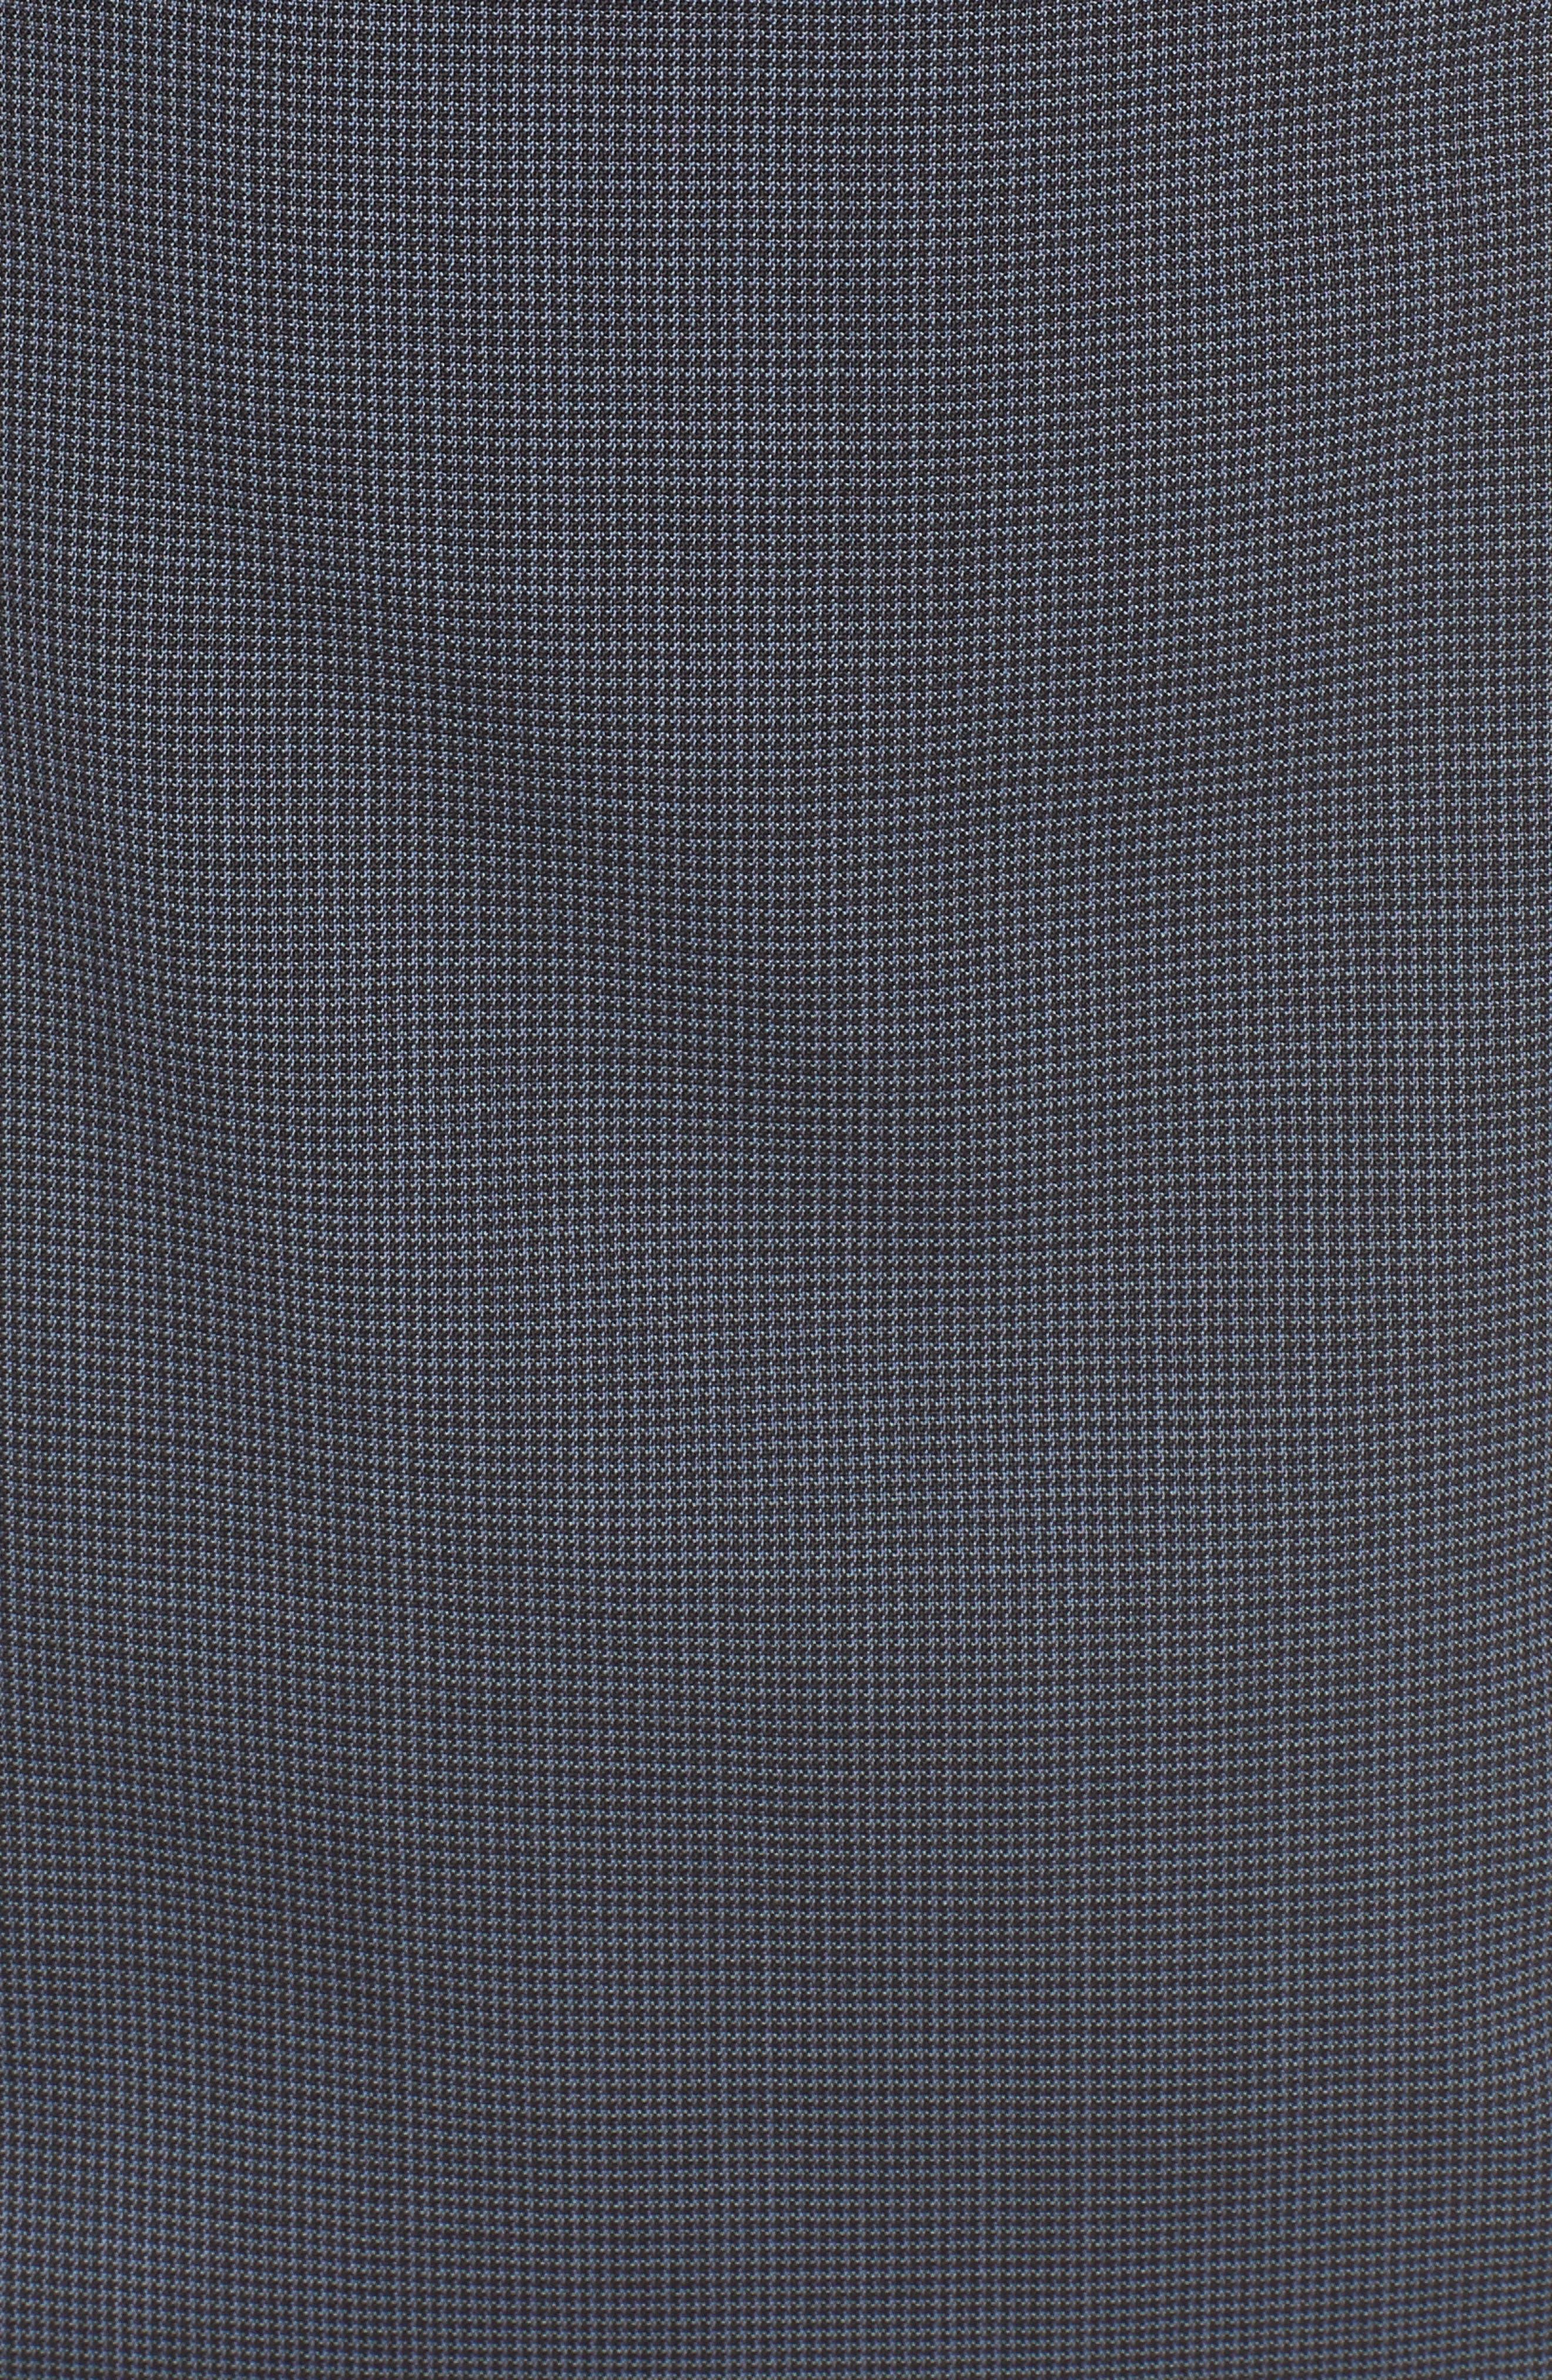 Dalouise Pepita Stretch Wool Sheath Dress,                             Alternate thumbnail 5, color,                             Nautic Blue Fantasy